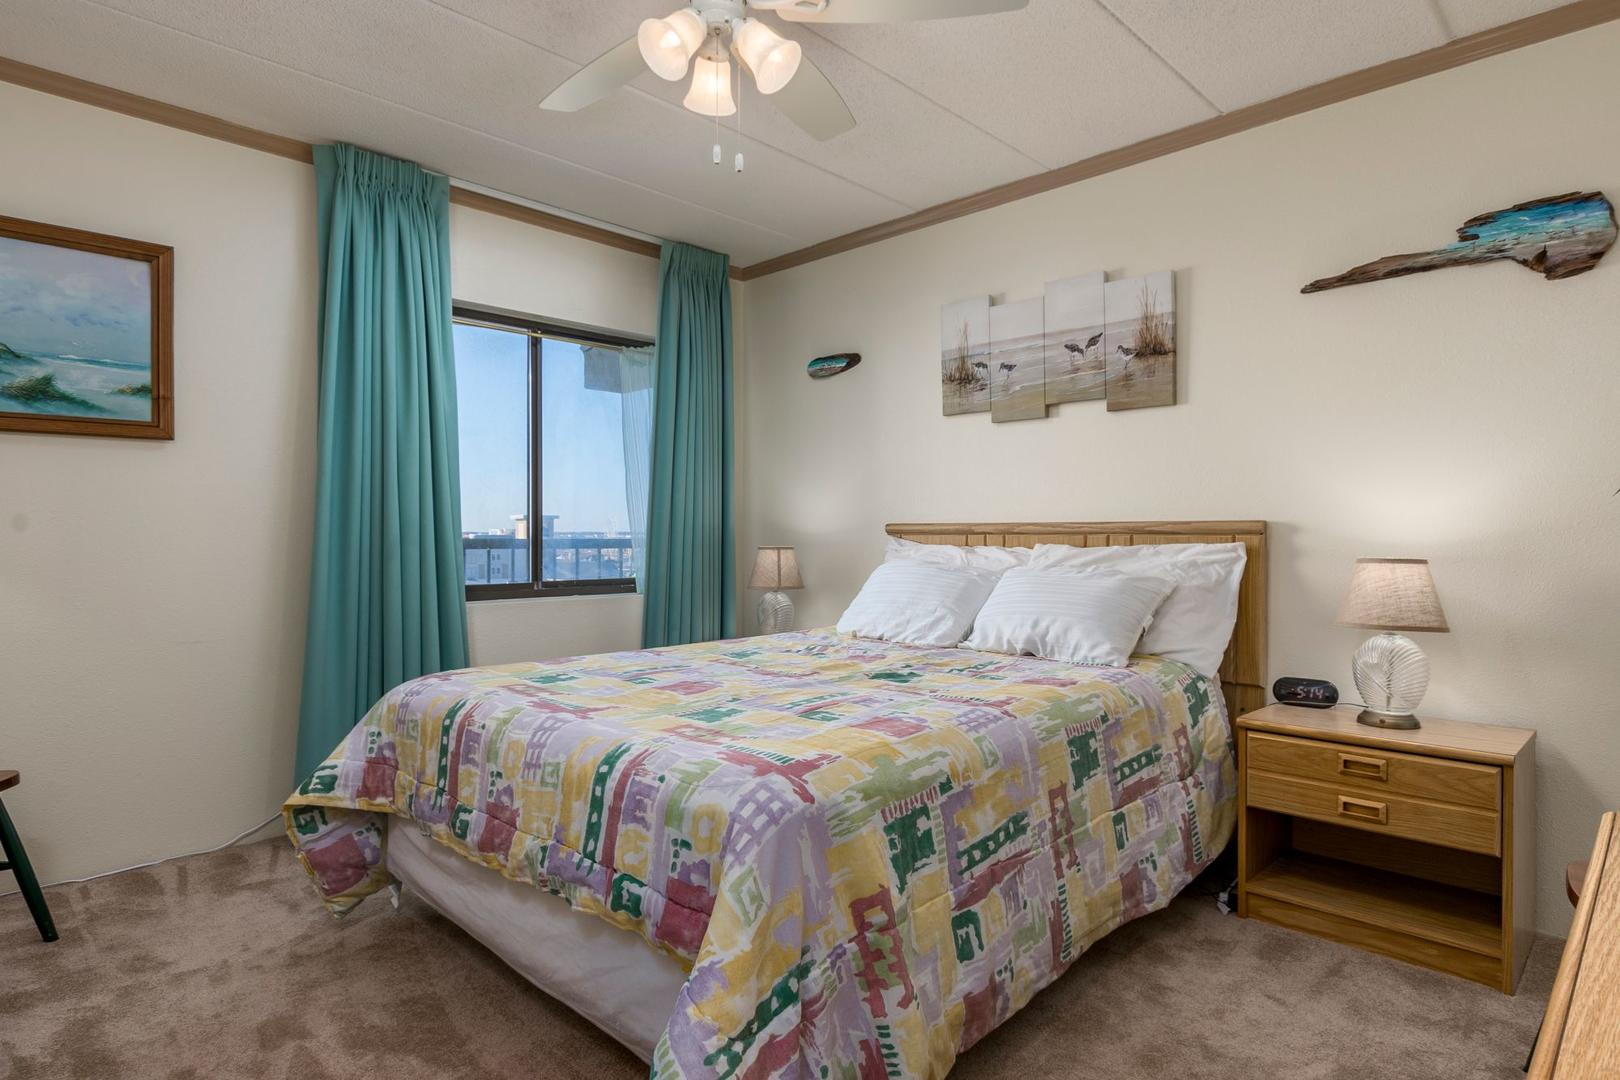 Summer Beach 605 - Bedroom 2